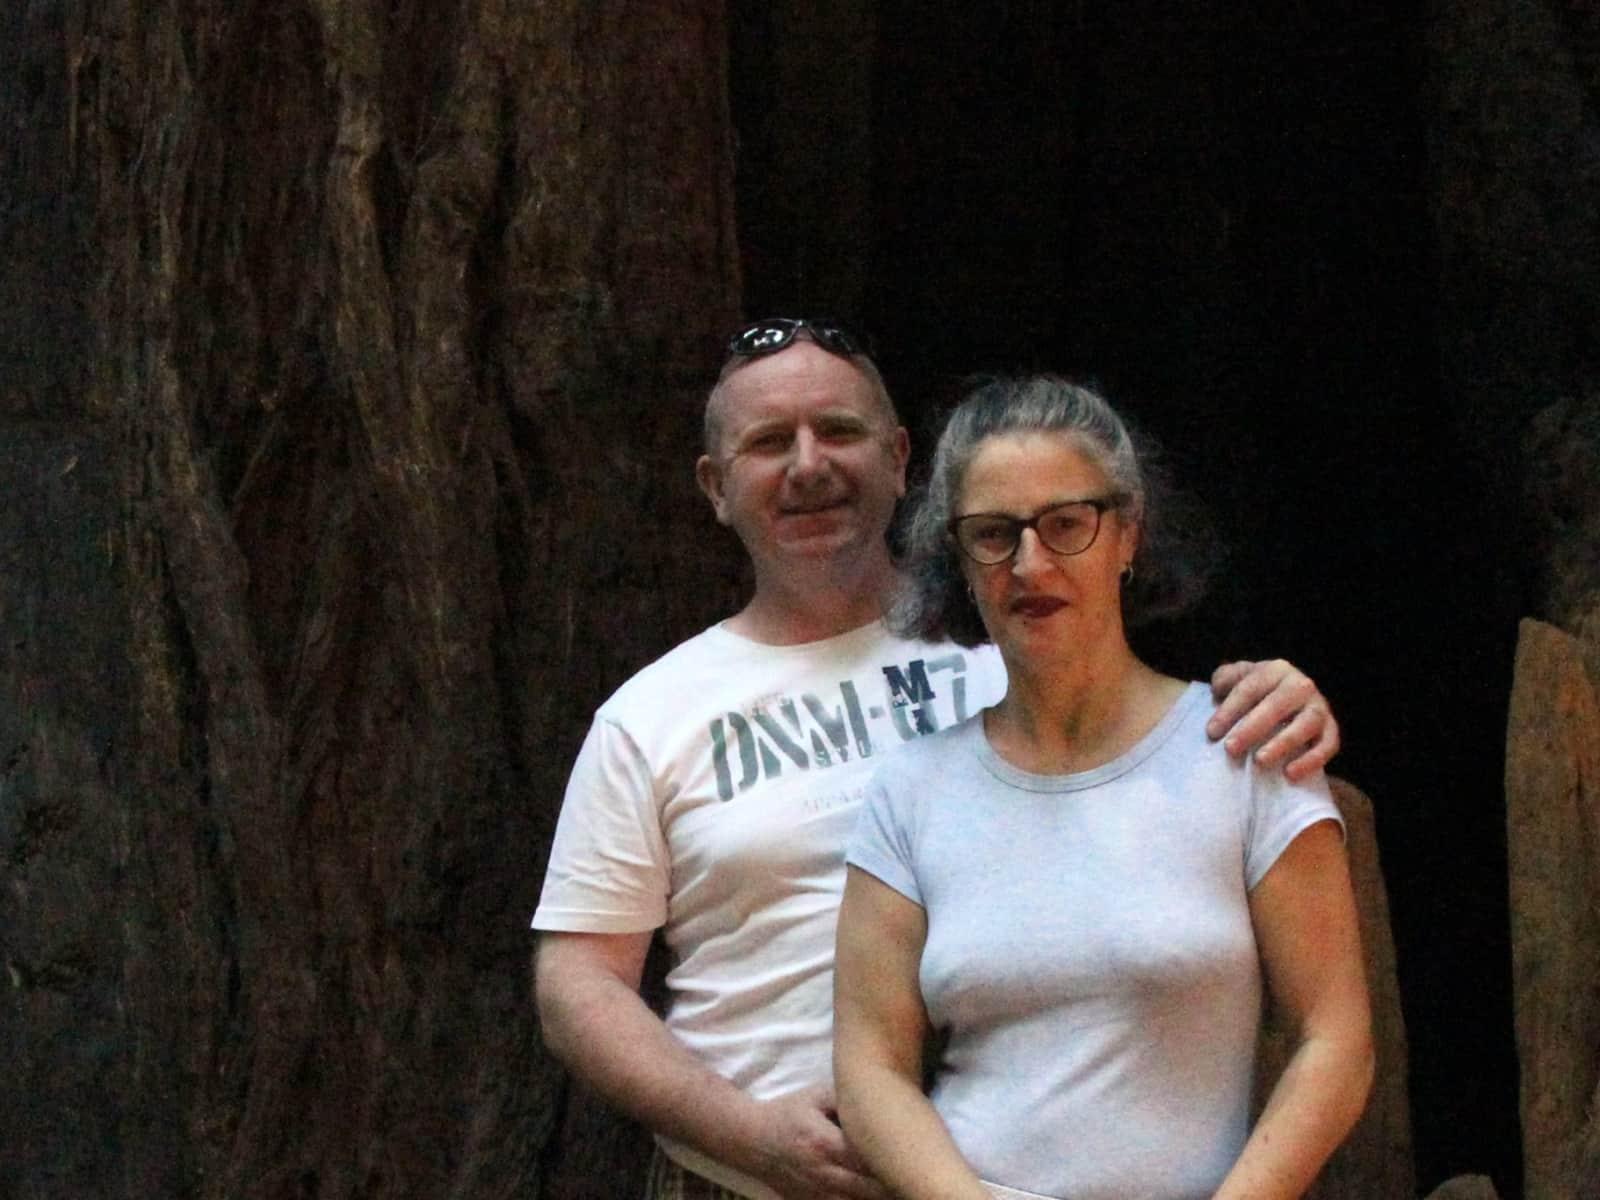 Arnaud & Delphine from Vancouver, British Columbia, Canada